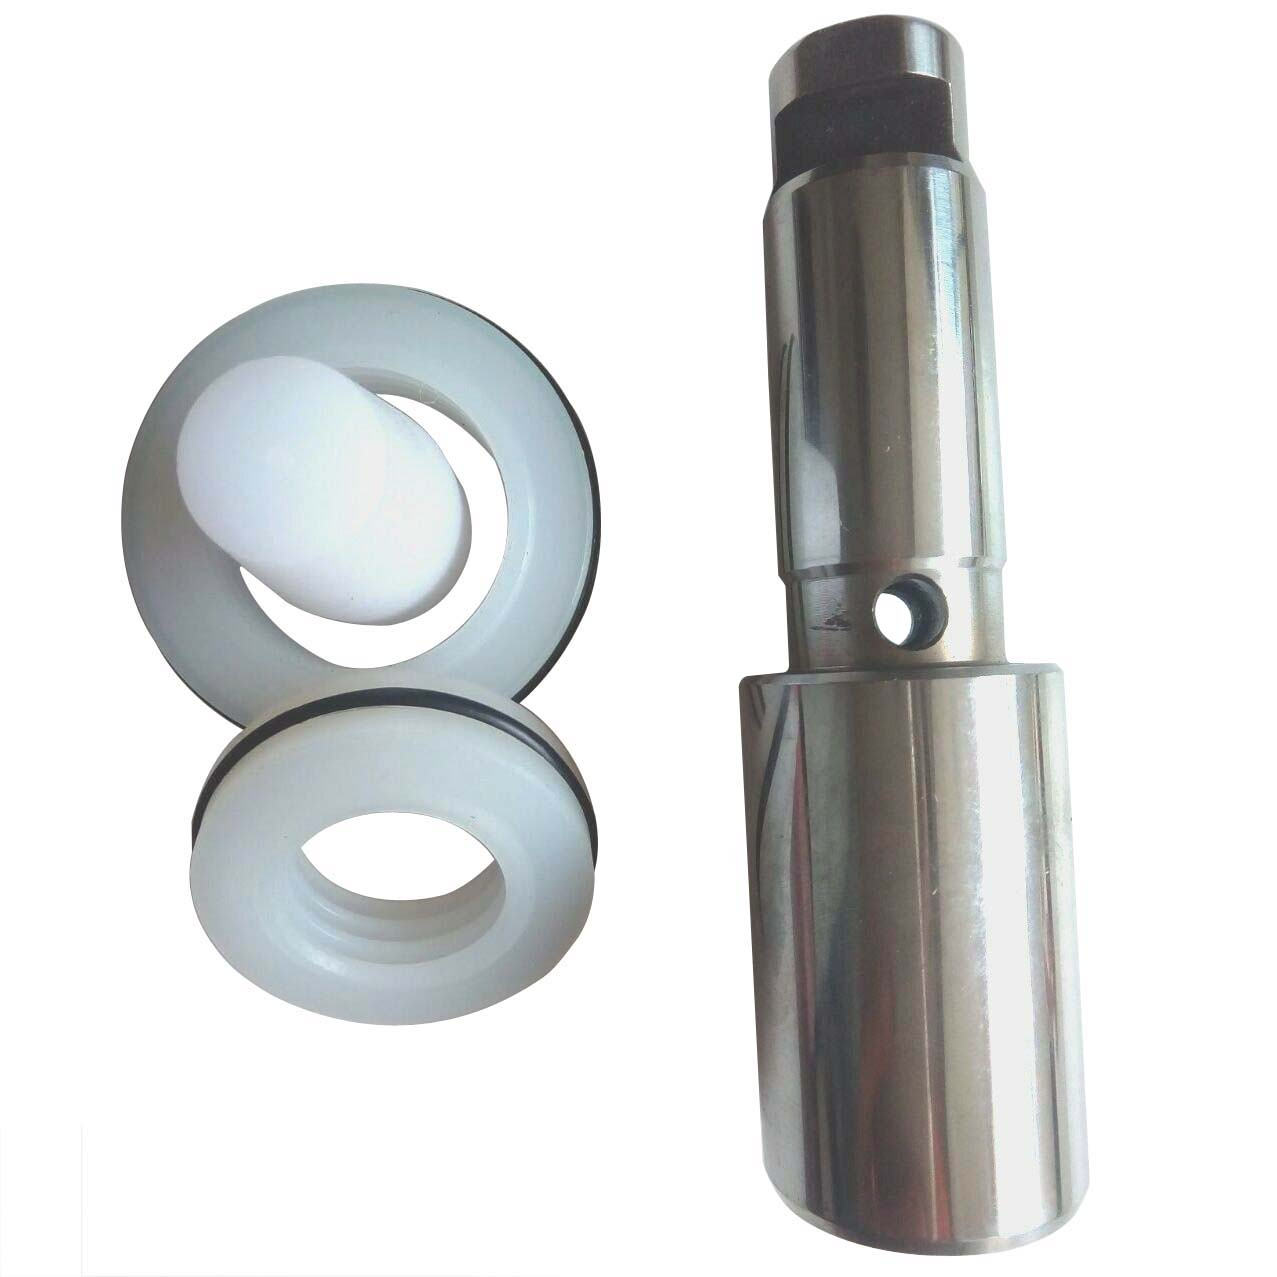 Aftermarket Airless Paint Piston Rod For Titan.740 750E 740i 740ix Piston Rod